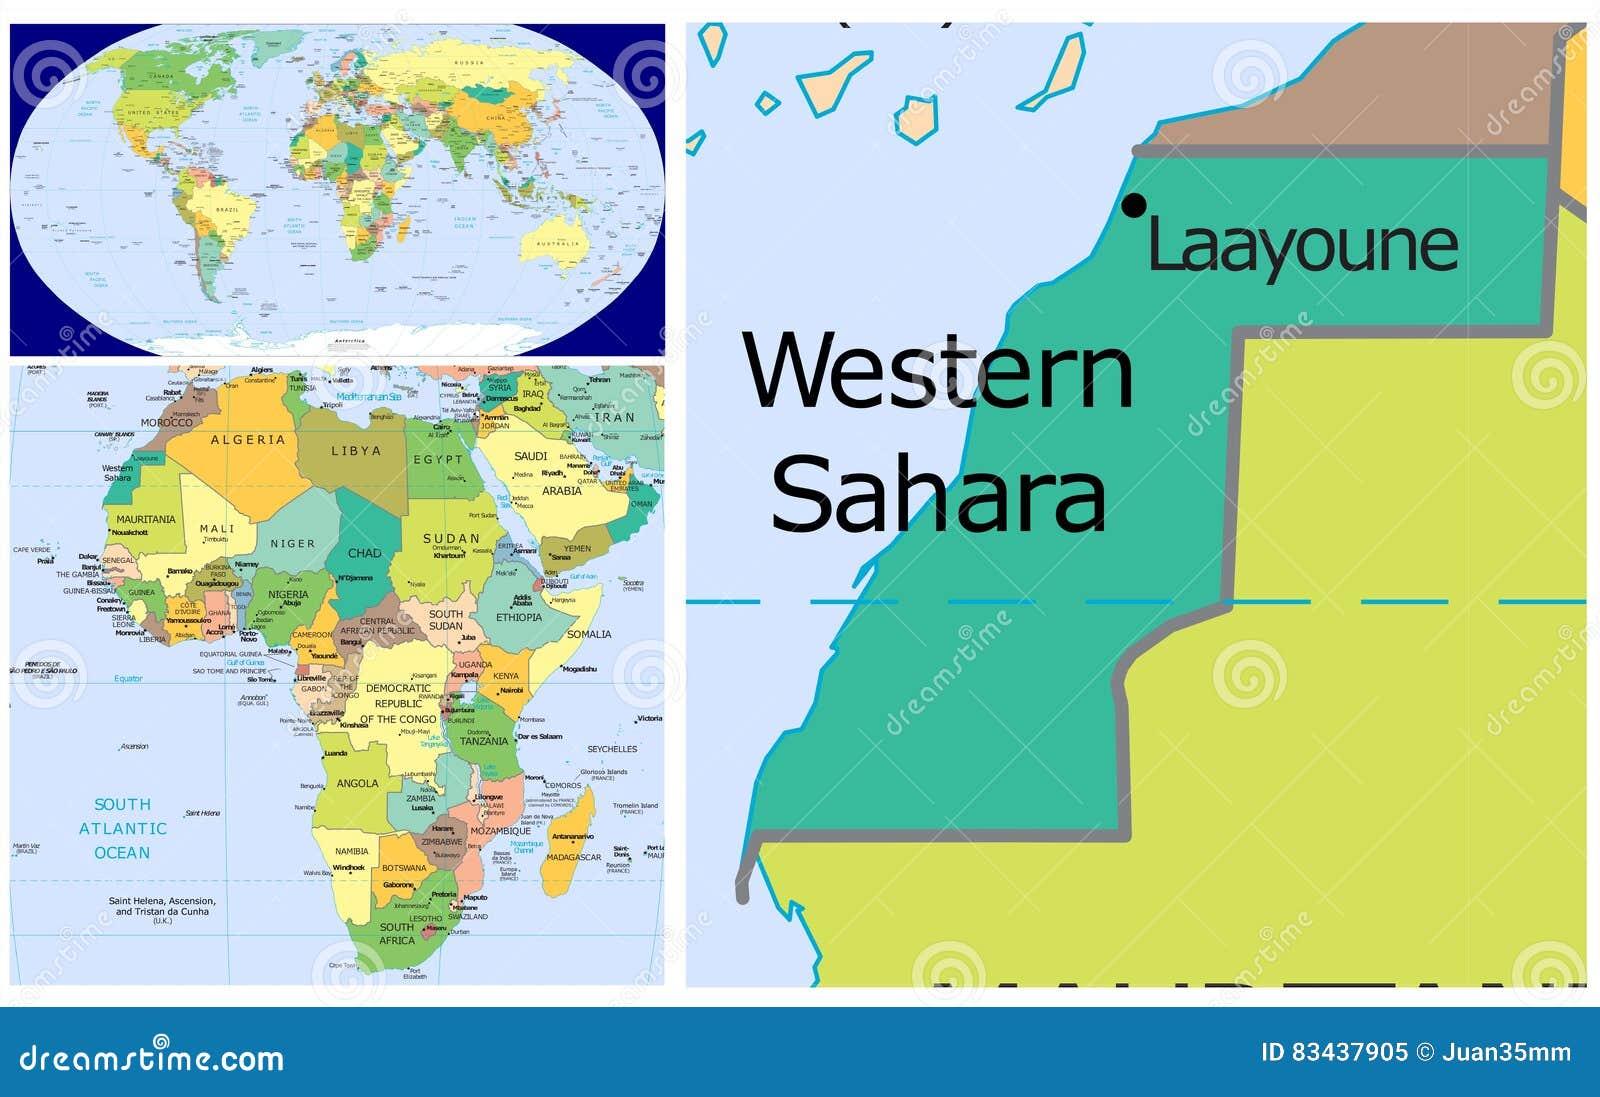 Image of: Western Sahara World Stock Illustration Illustration Of Country 83437905